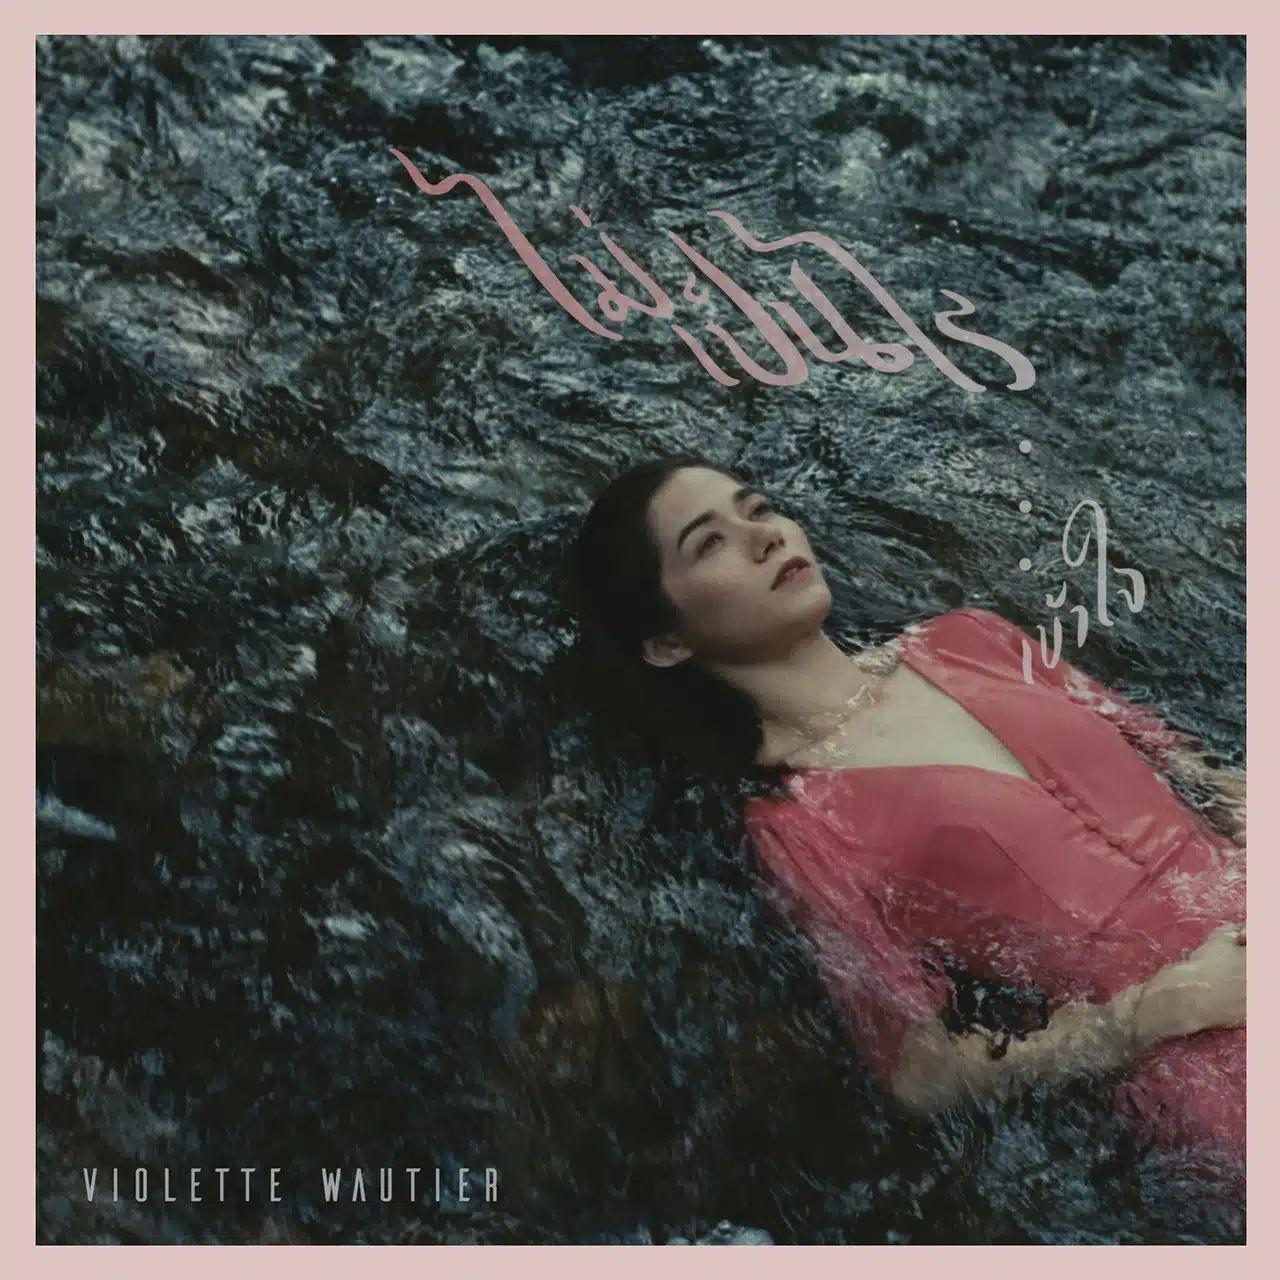 Goodbye Violette Wautier